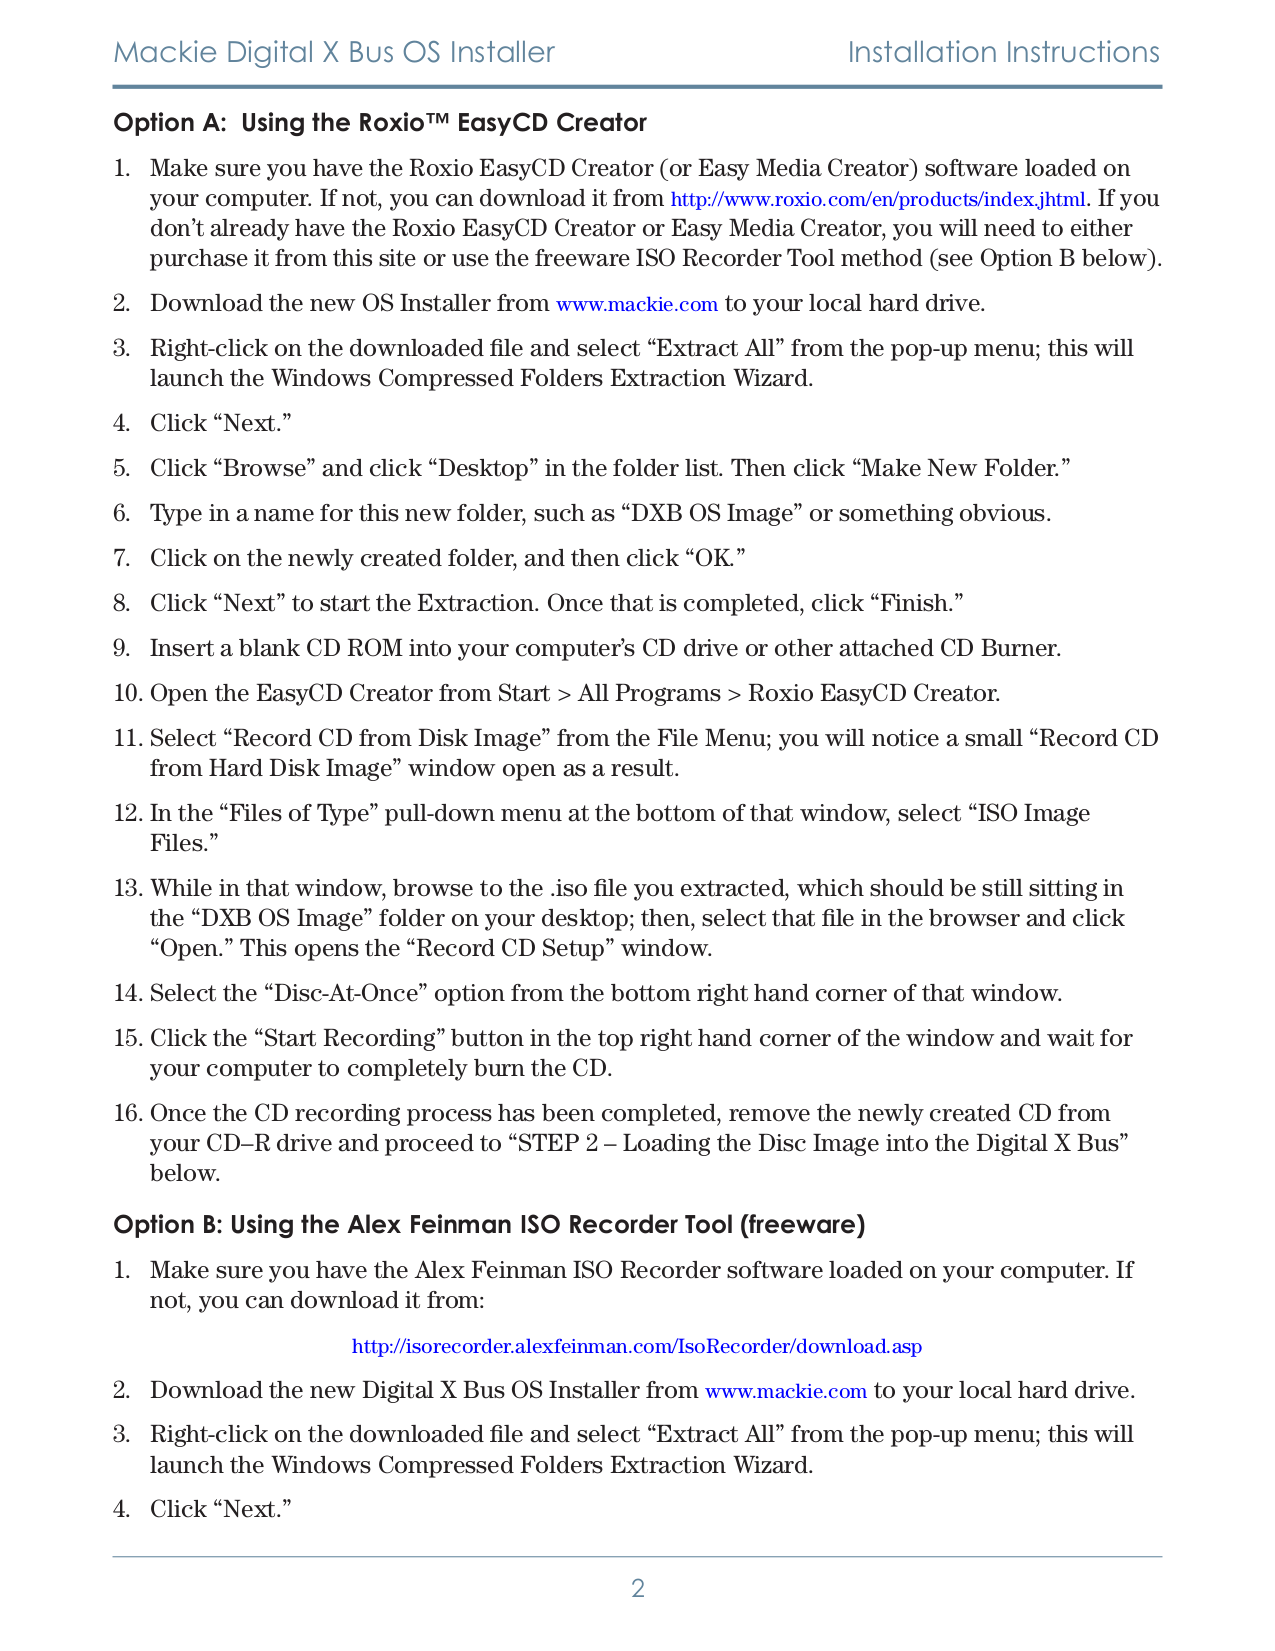 PDF manual for Mackie Other Digital X Bus DXB 200 Digital